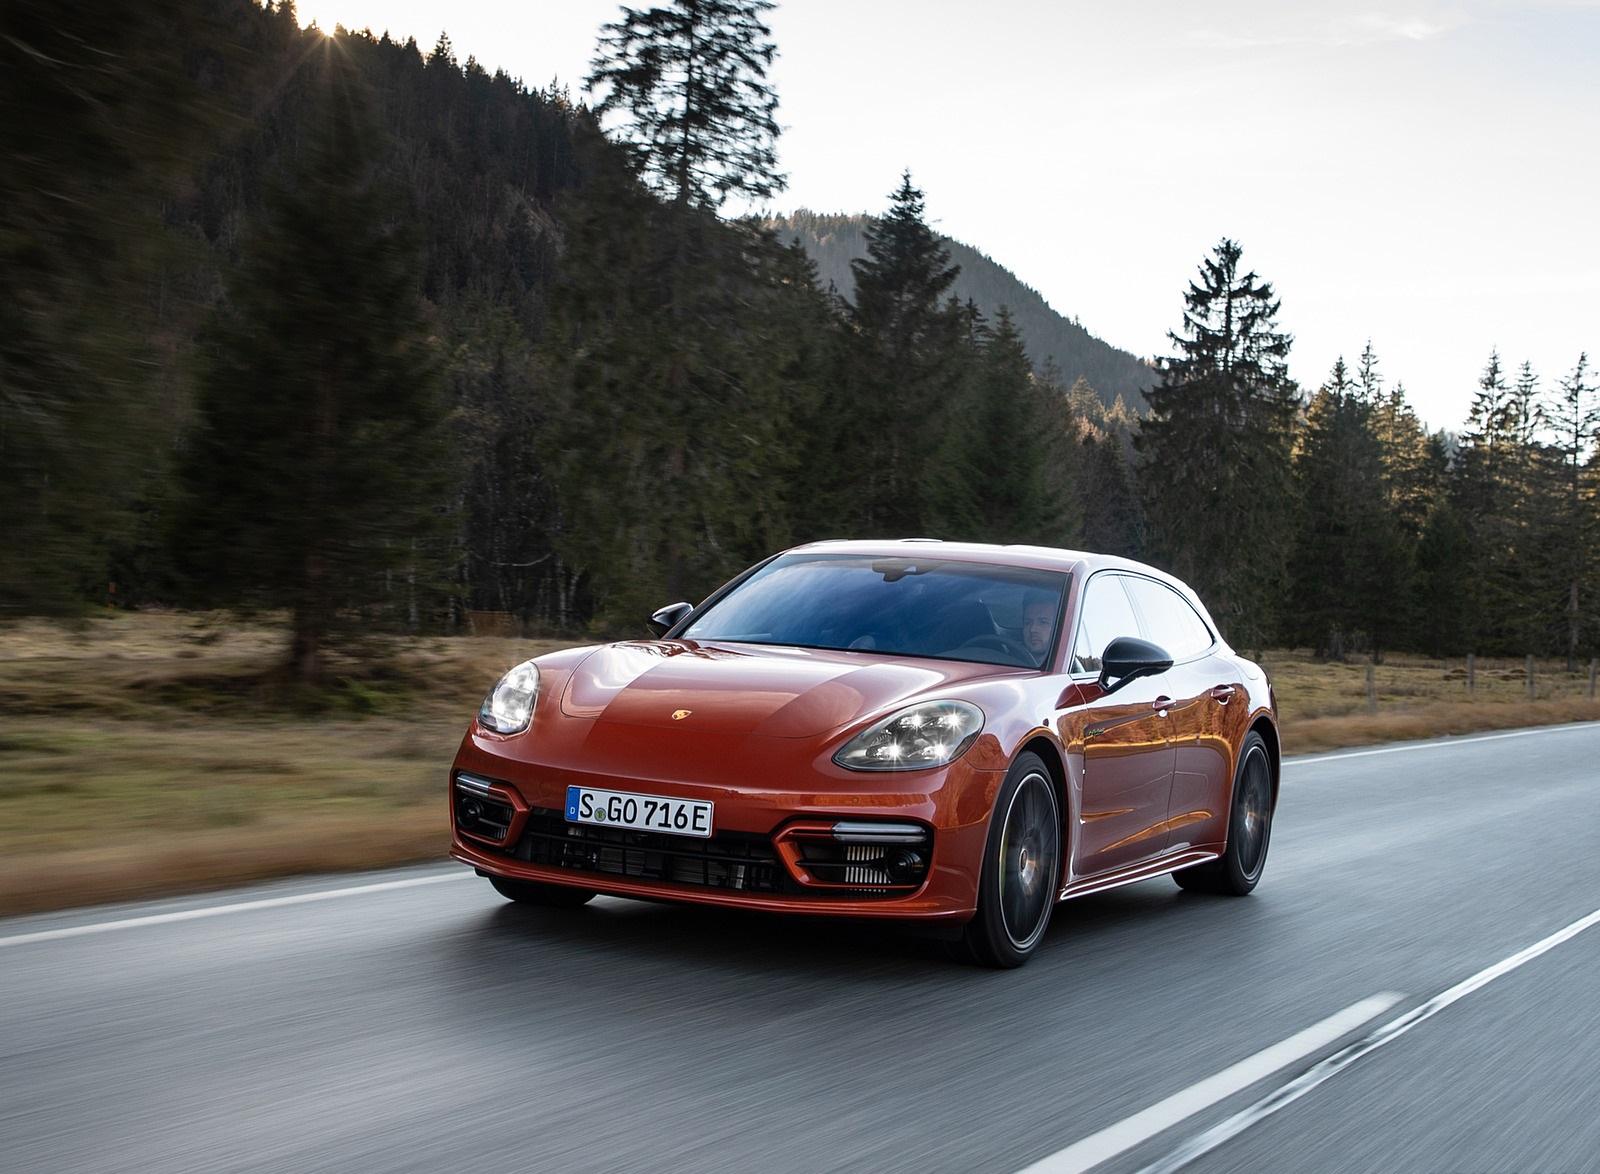 2021 Porsche Panamera 4 E-Hybrid Sport Turismo (Color: Papaya Metallic) Front Three-Quarter Wallpapers (1)